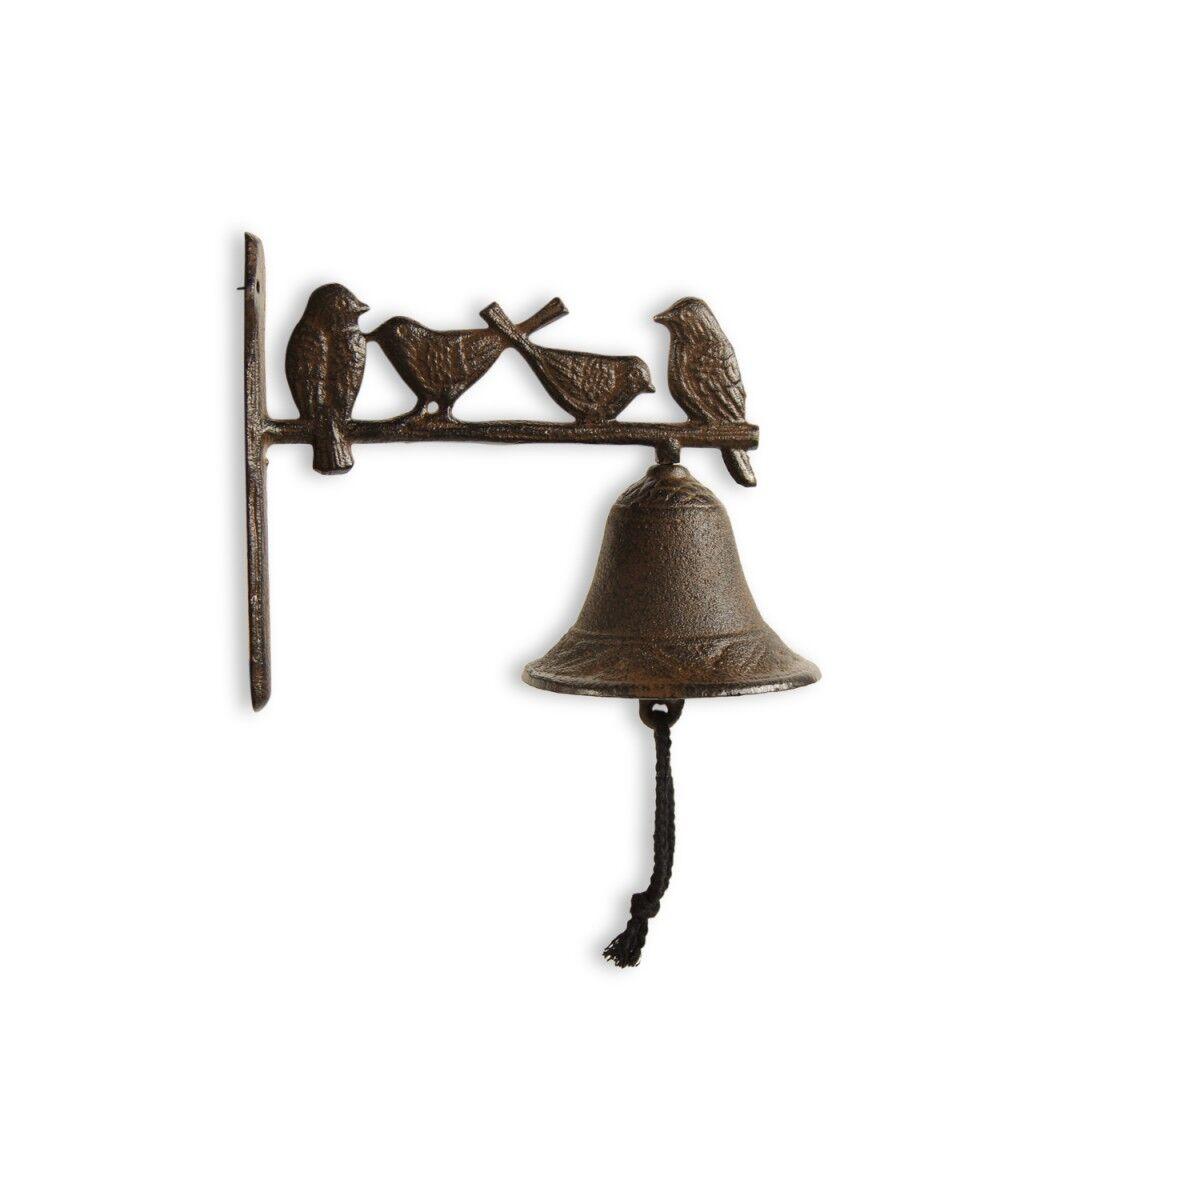 Cloche Oiseaux Fonte Marron 21.5x11.5x19.5cm